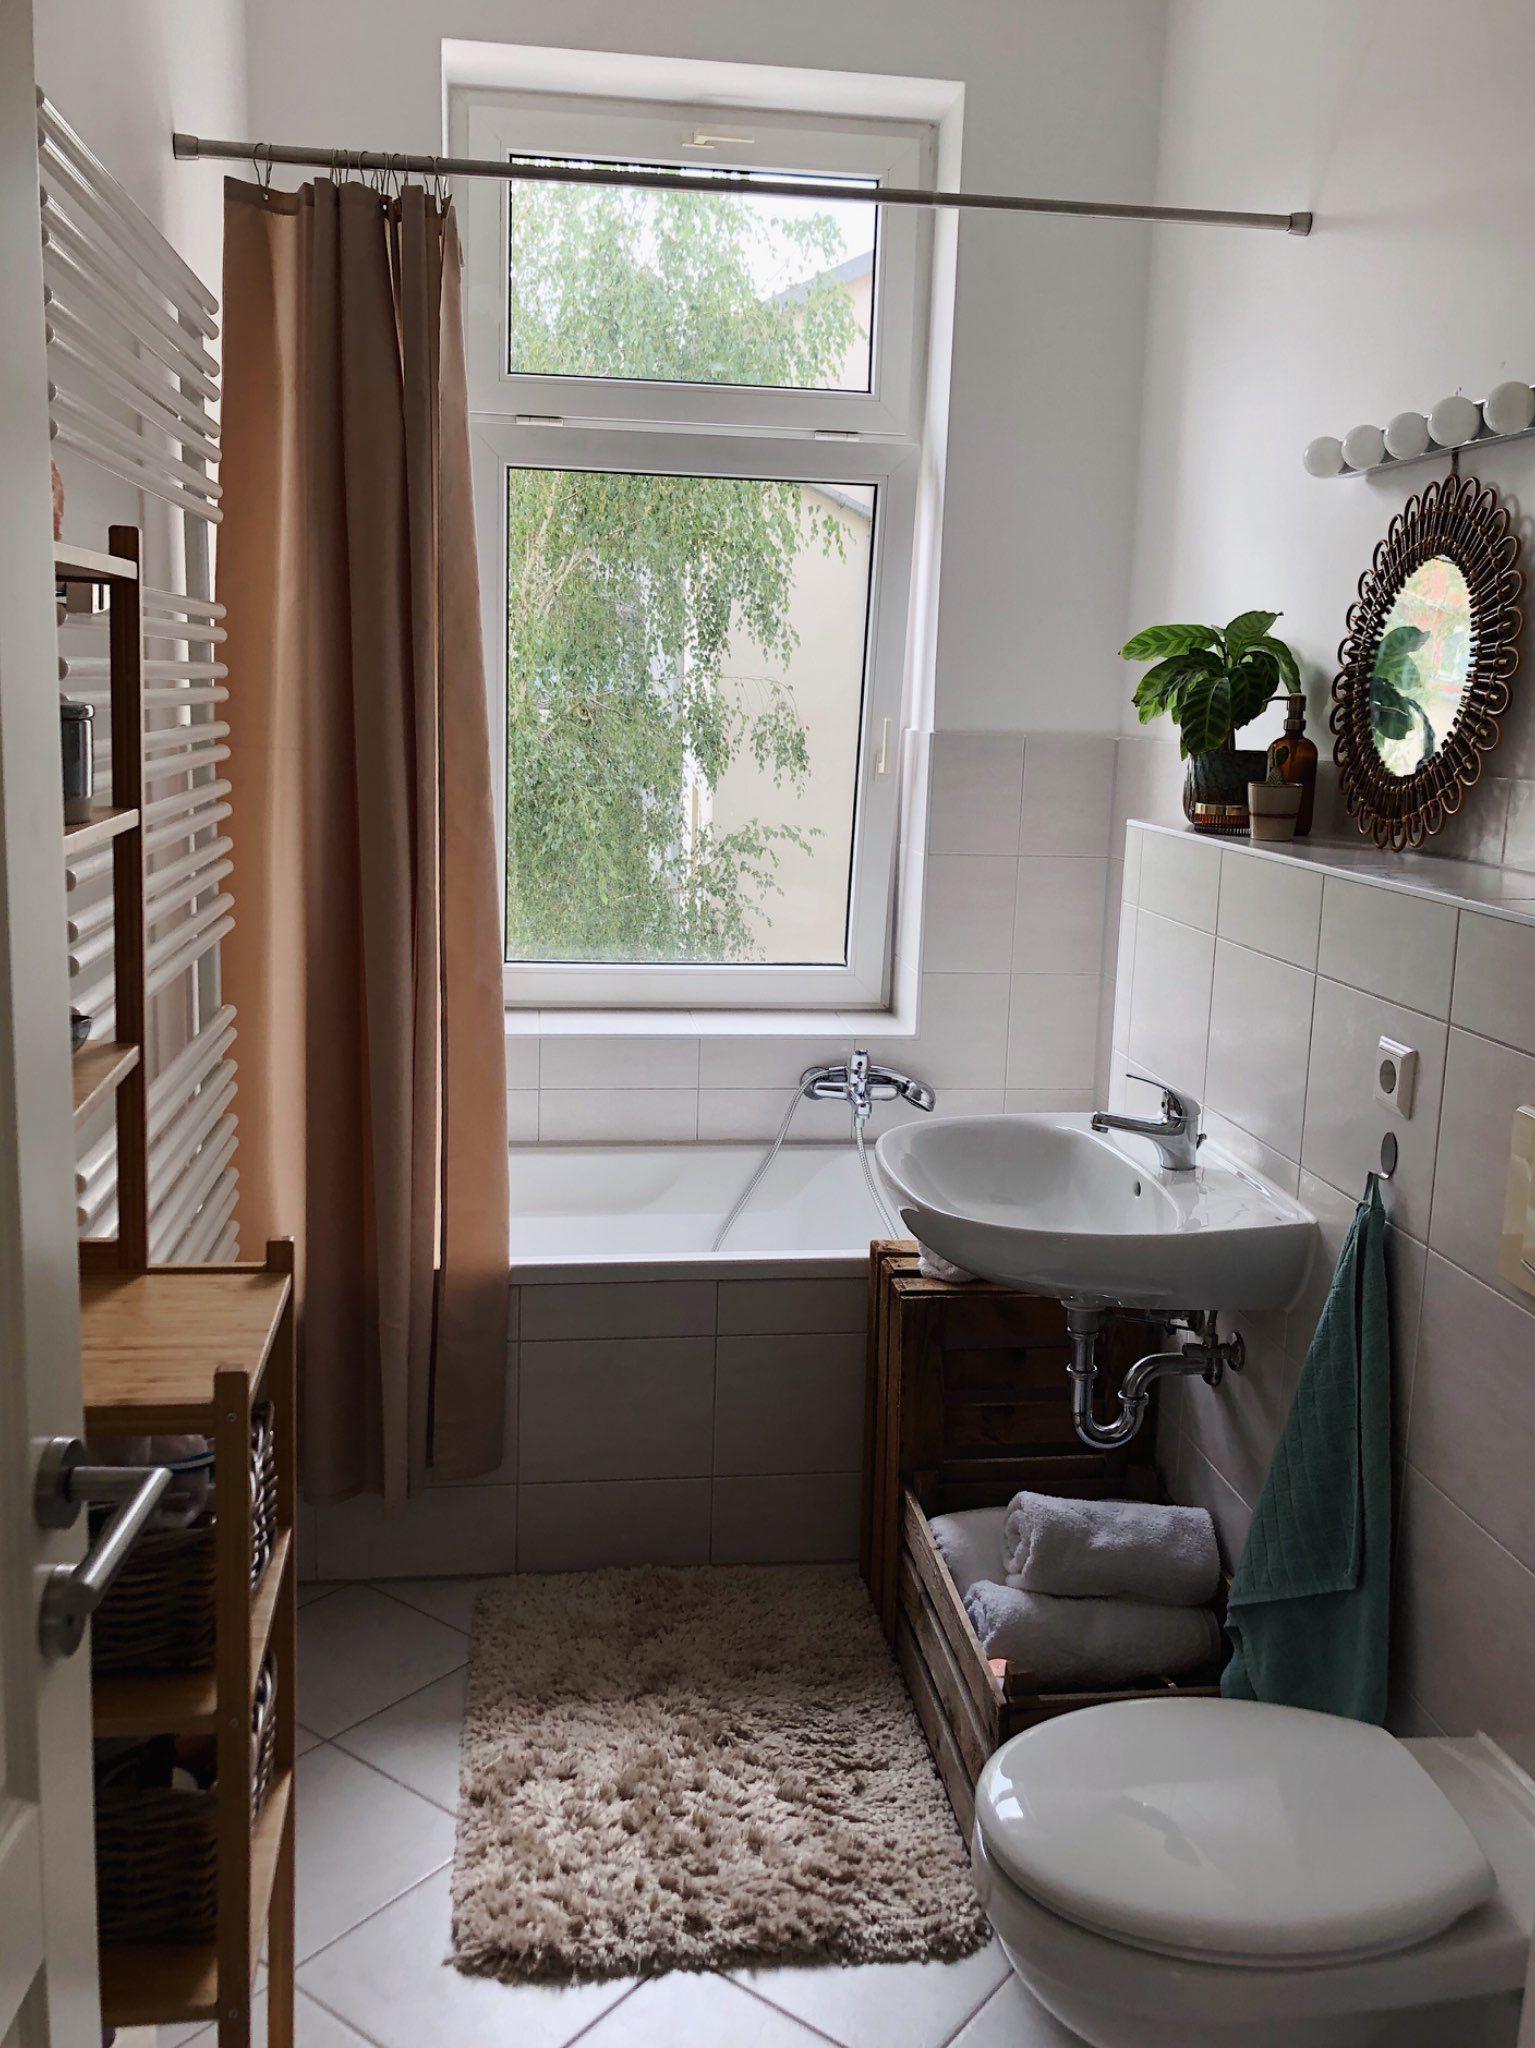 Wunderschones Helles Badezimmer Badezimmer Helle Badezimmer Schlafzimmer